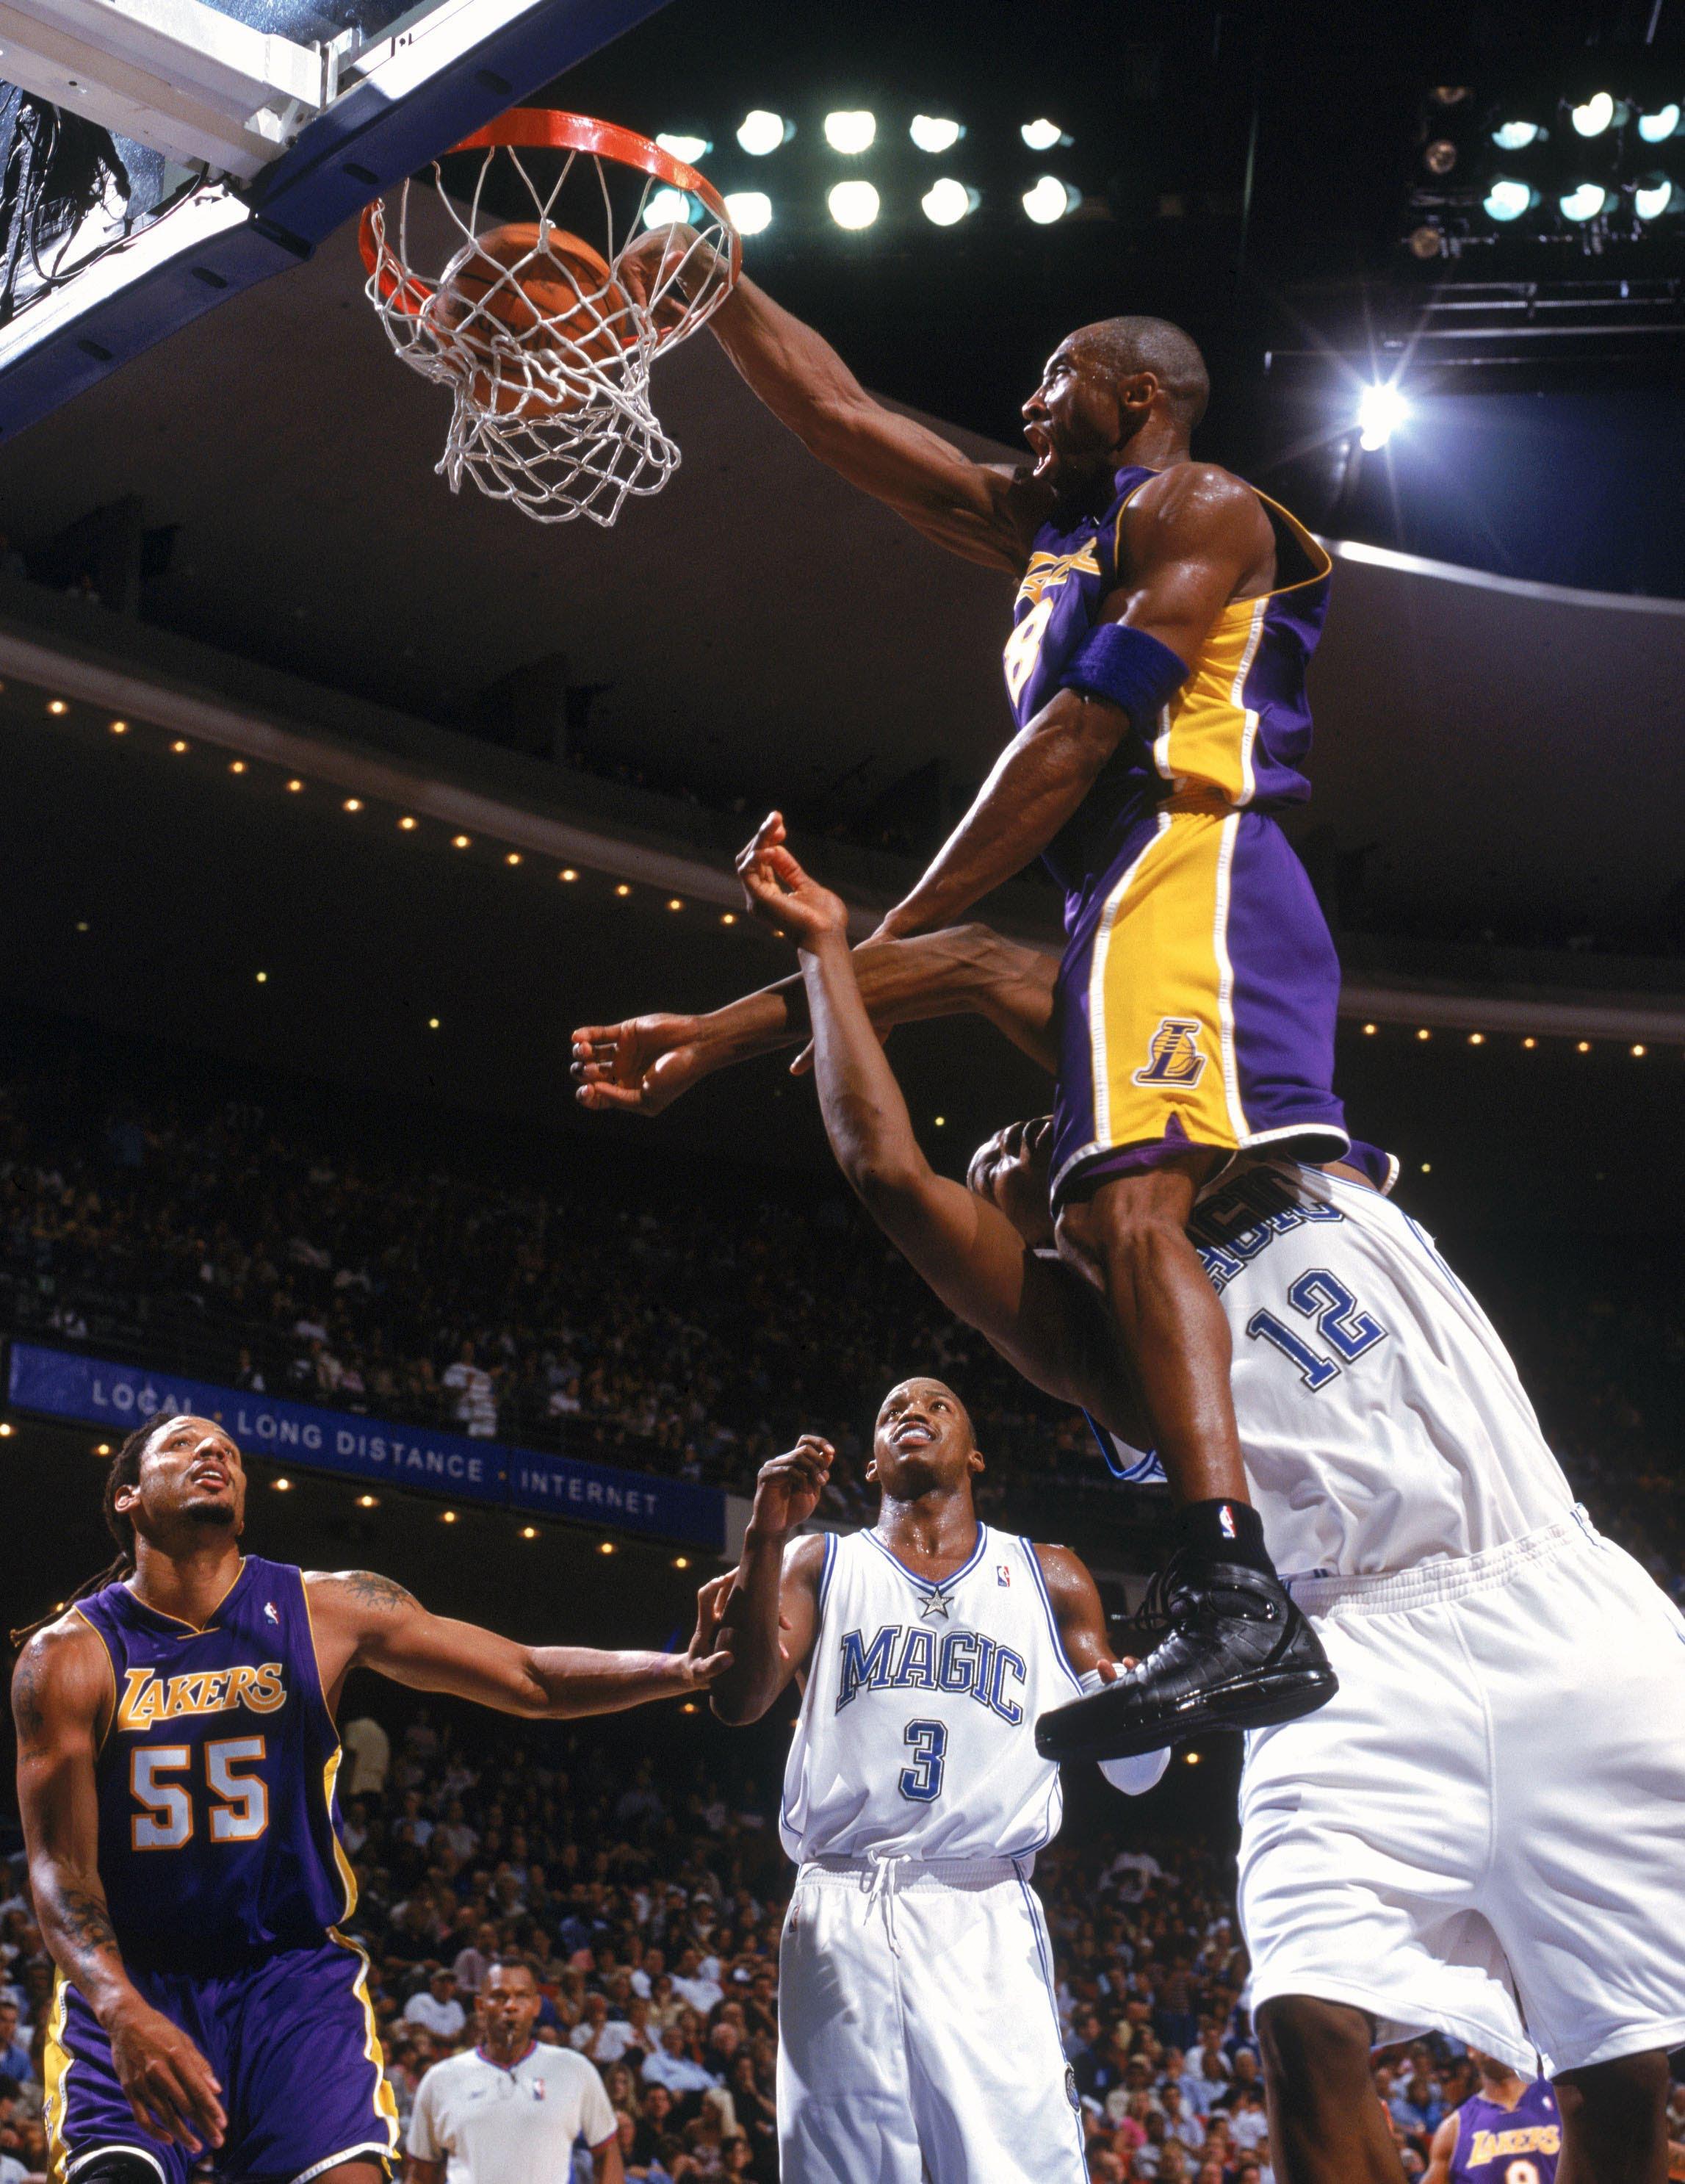 2004 Kobe Dwight 2K4 Dunk